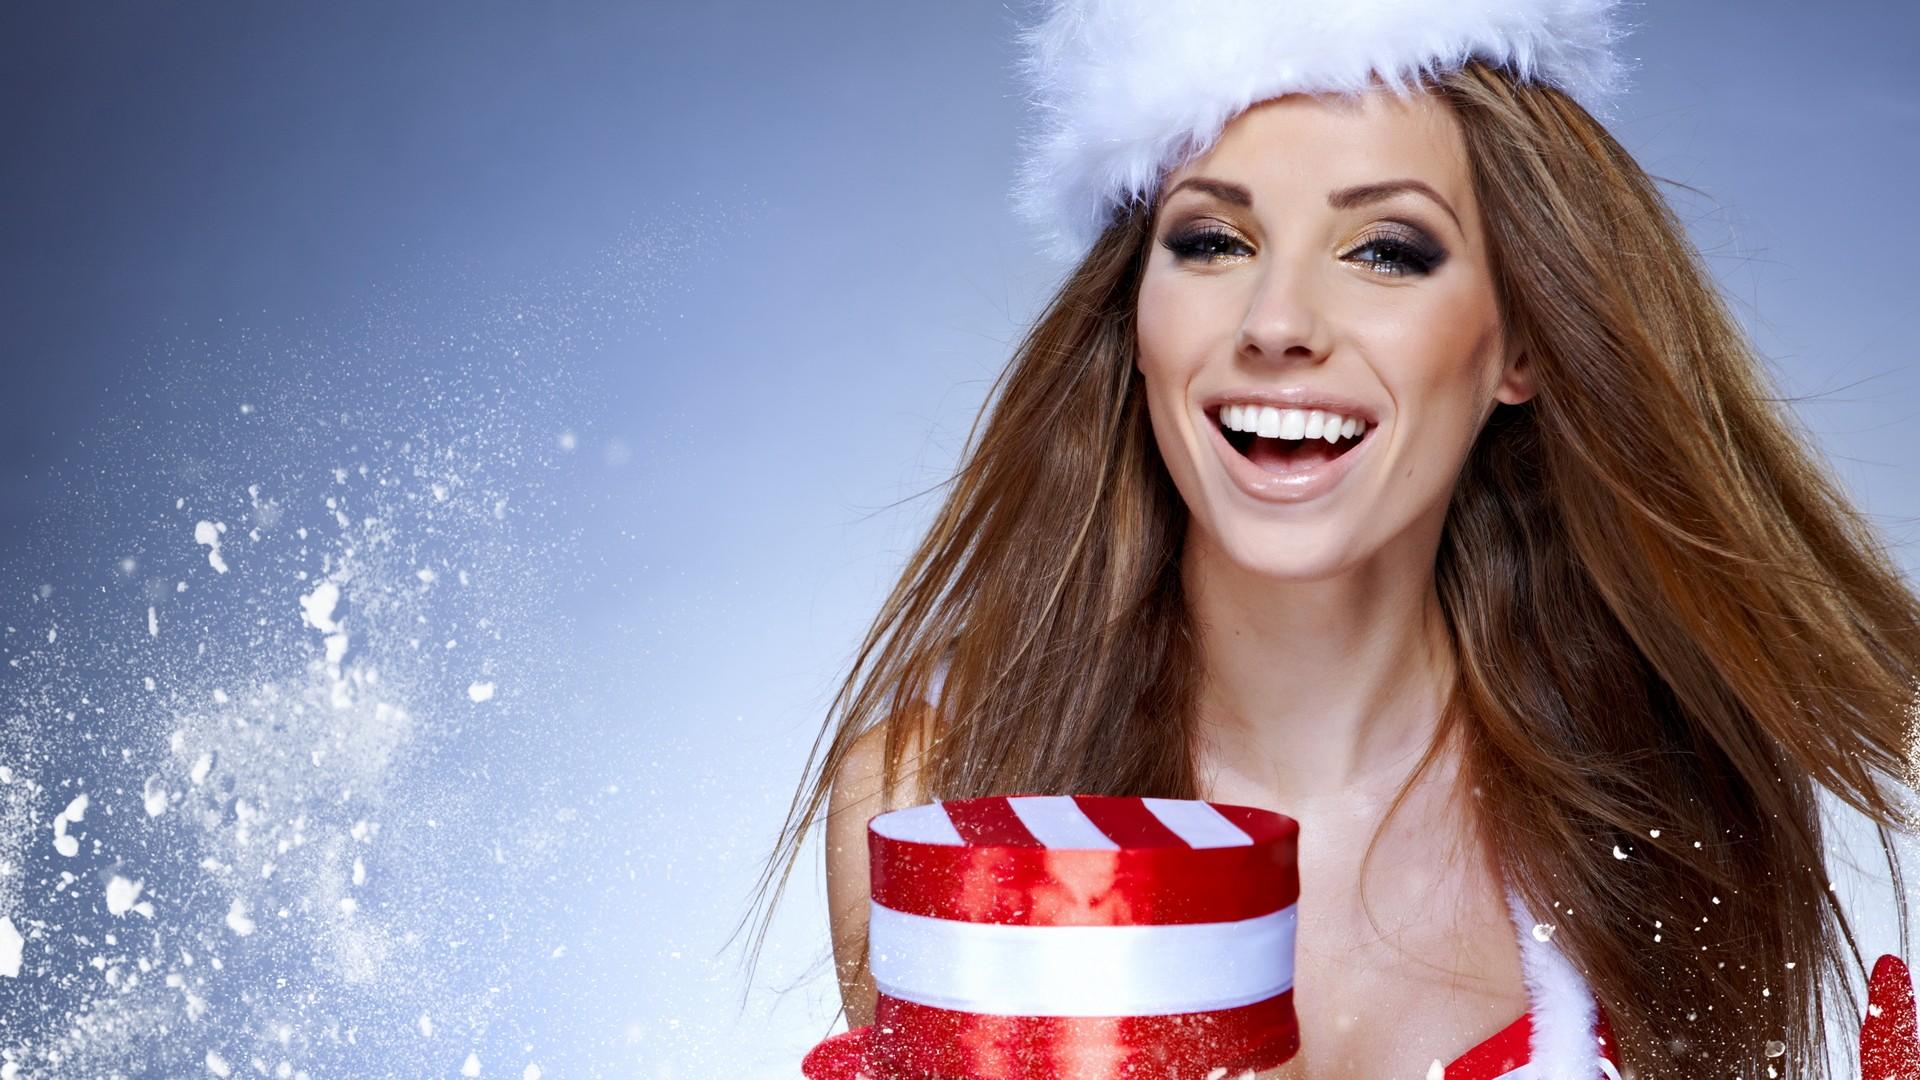 Christmas Model.Women Models Christmas Christmas Outfits Santa Wallpaper